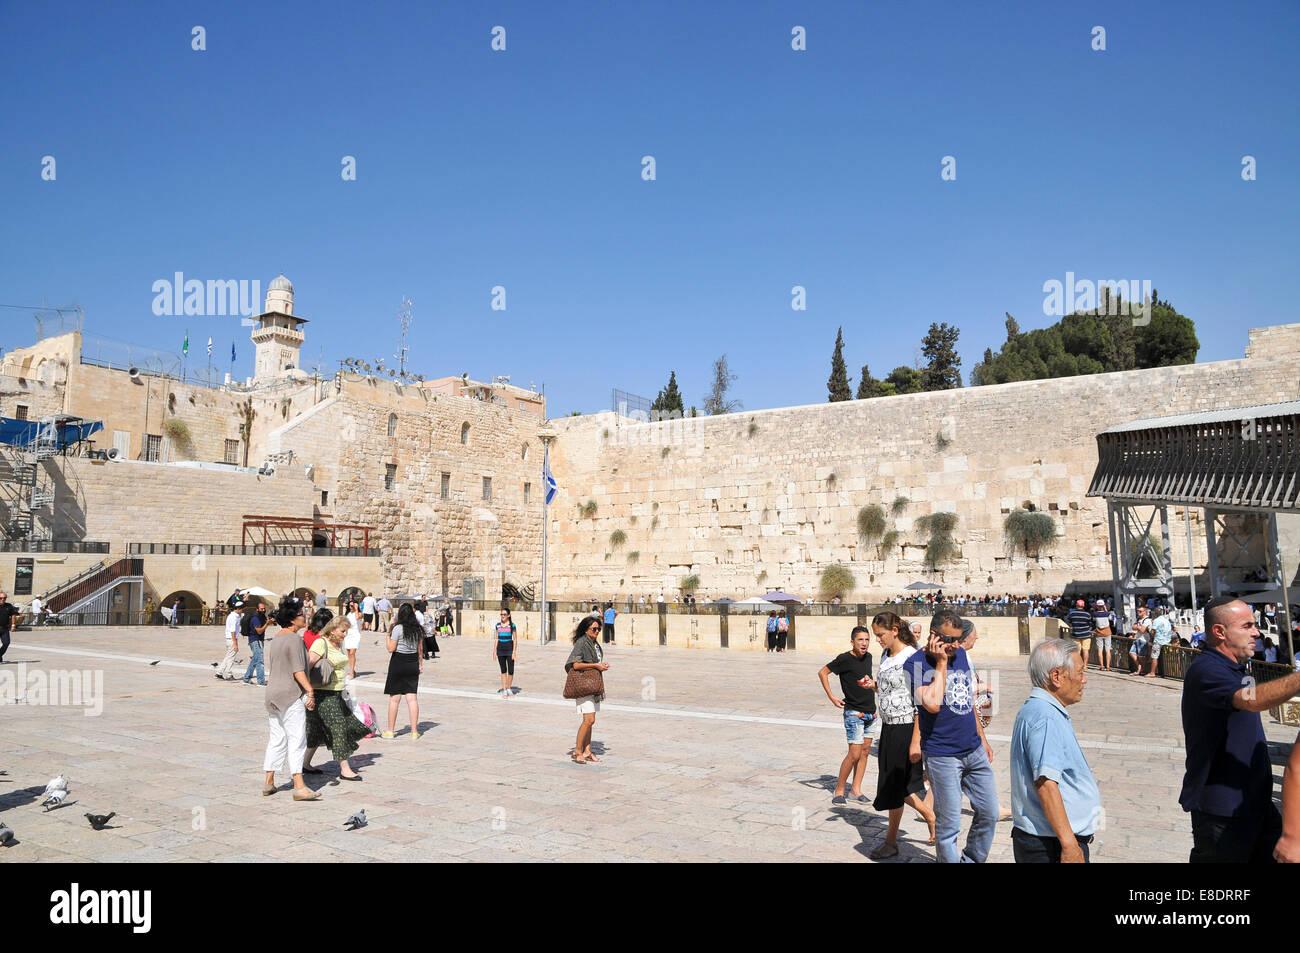 The wailing wall, Old City, Jerusalem, Israel - Stock Image